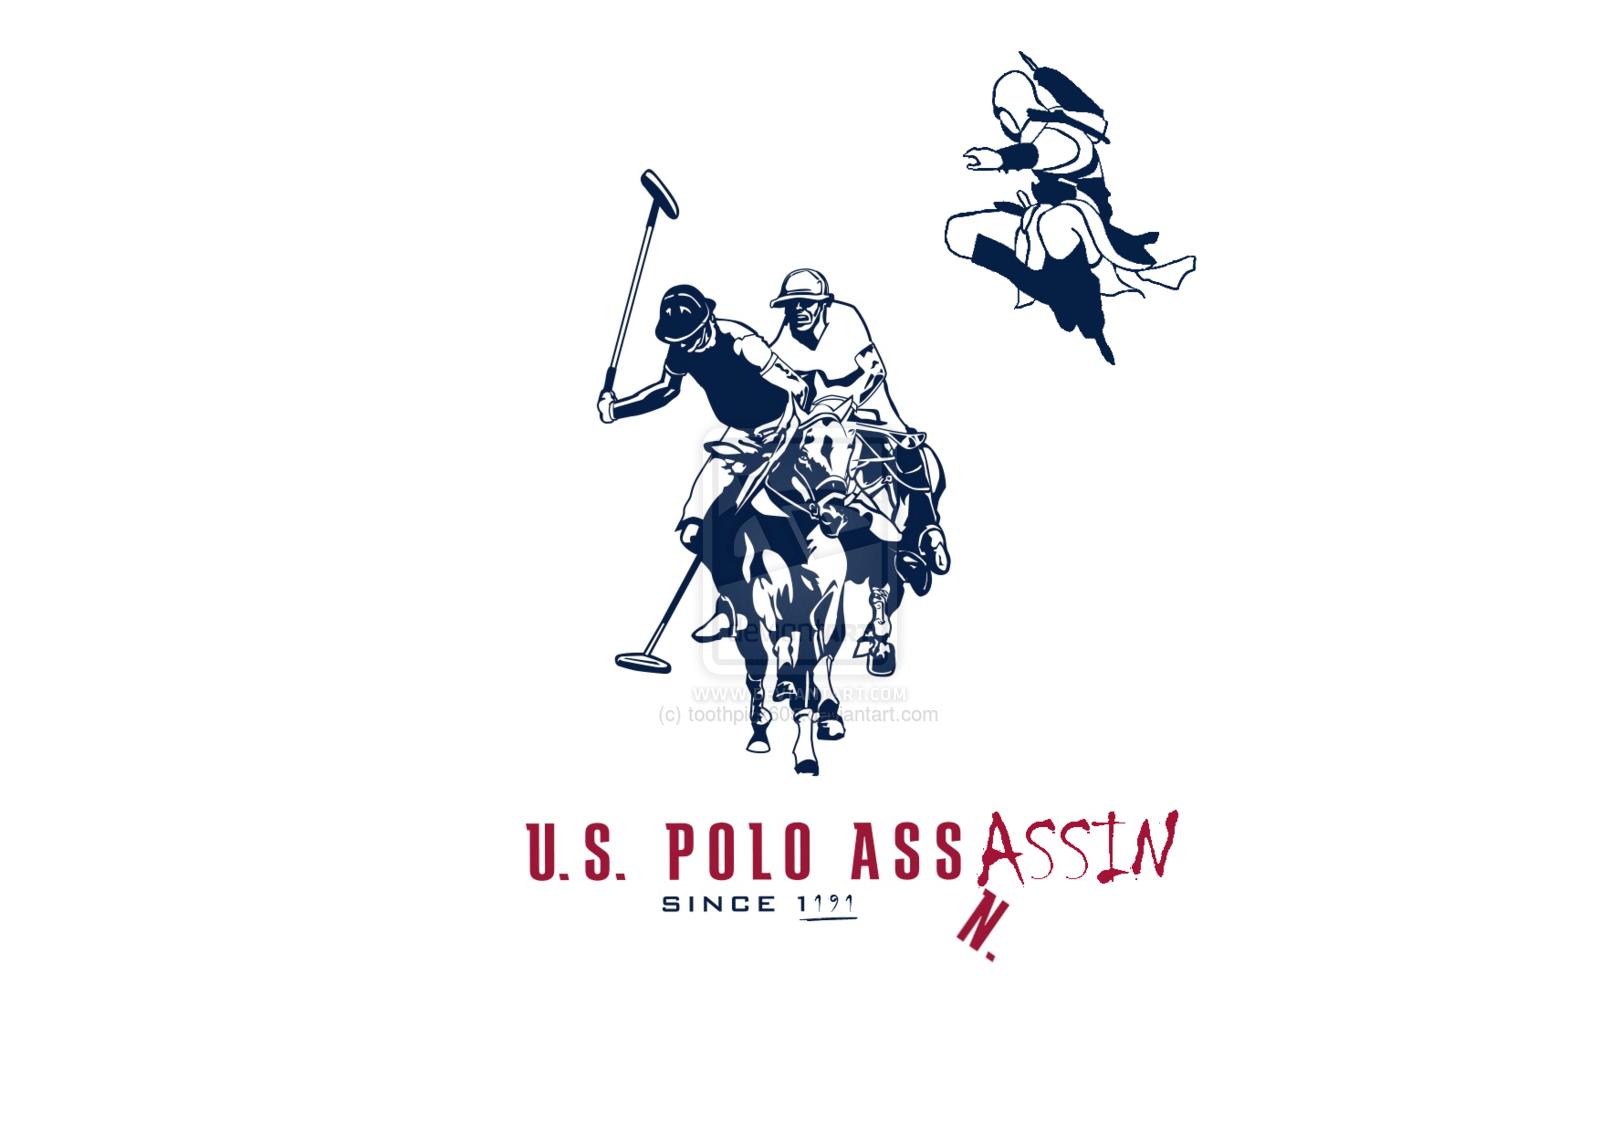 Polo Ralph Lauren Logo Wallpapers - Wallpaper Cave